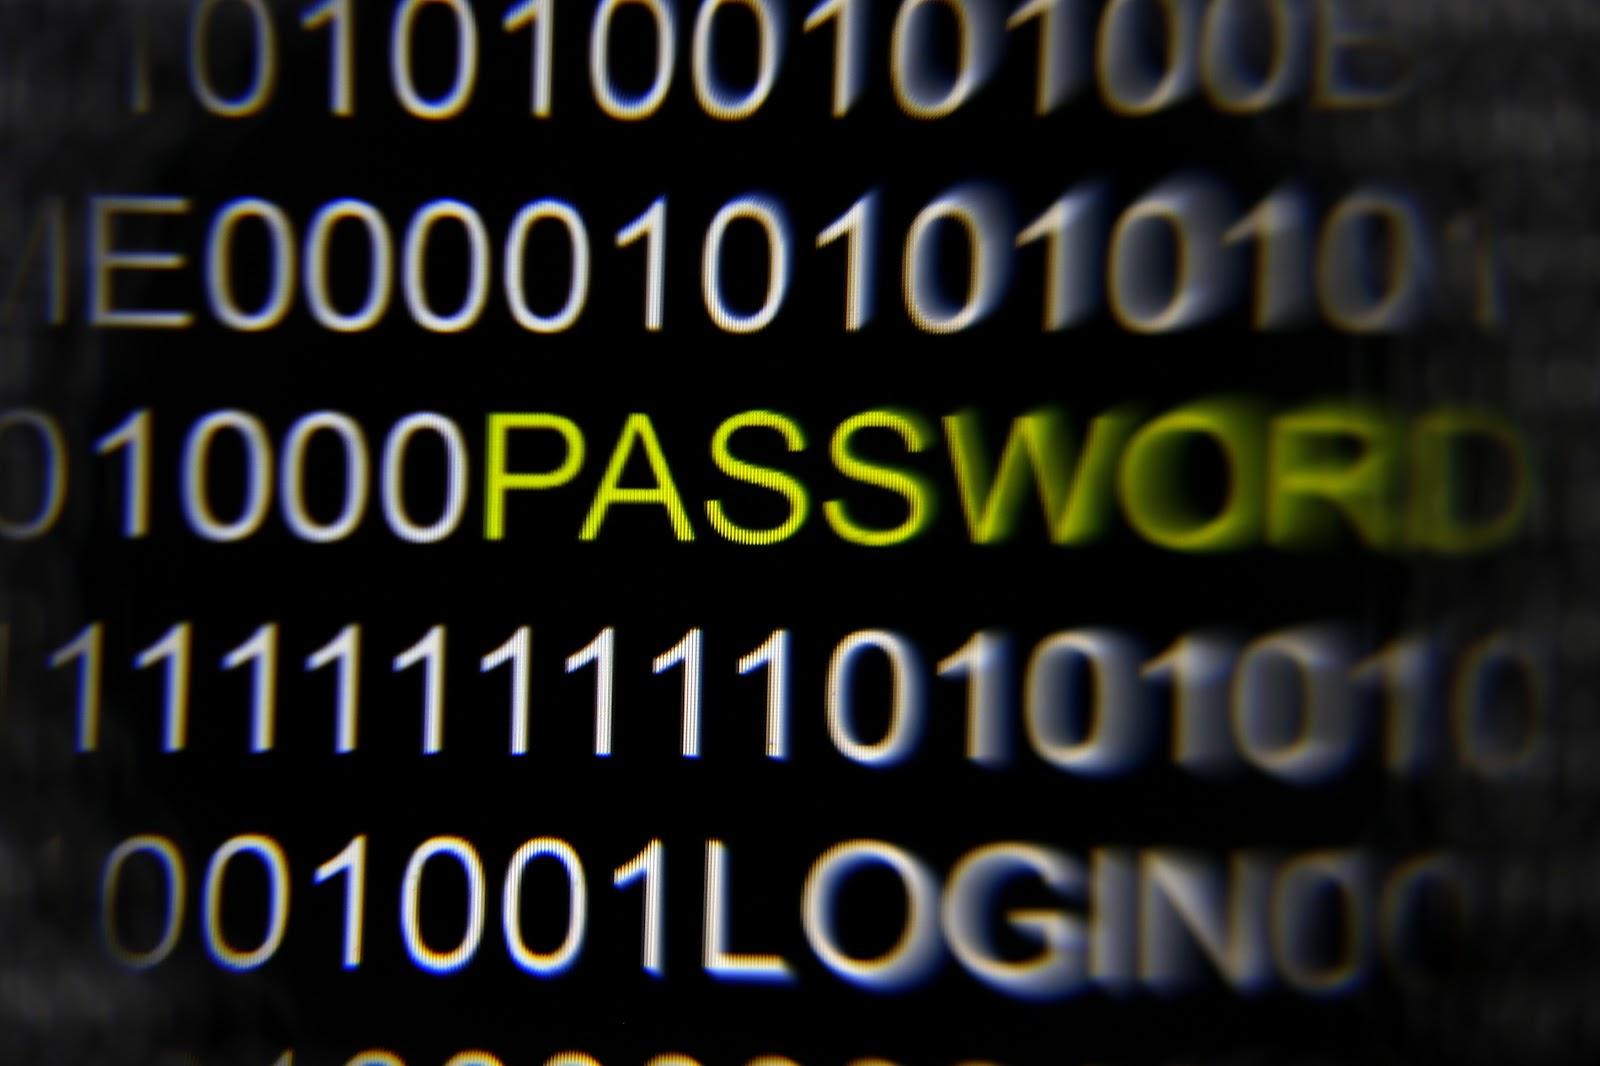 password-security-3